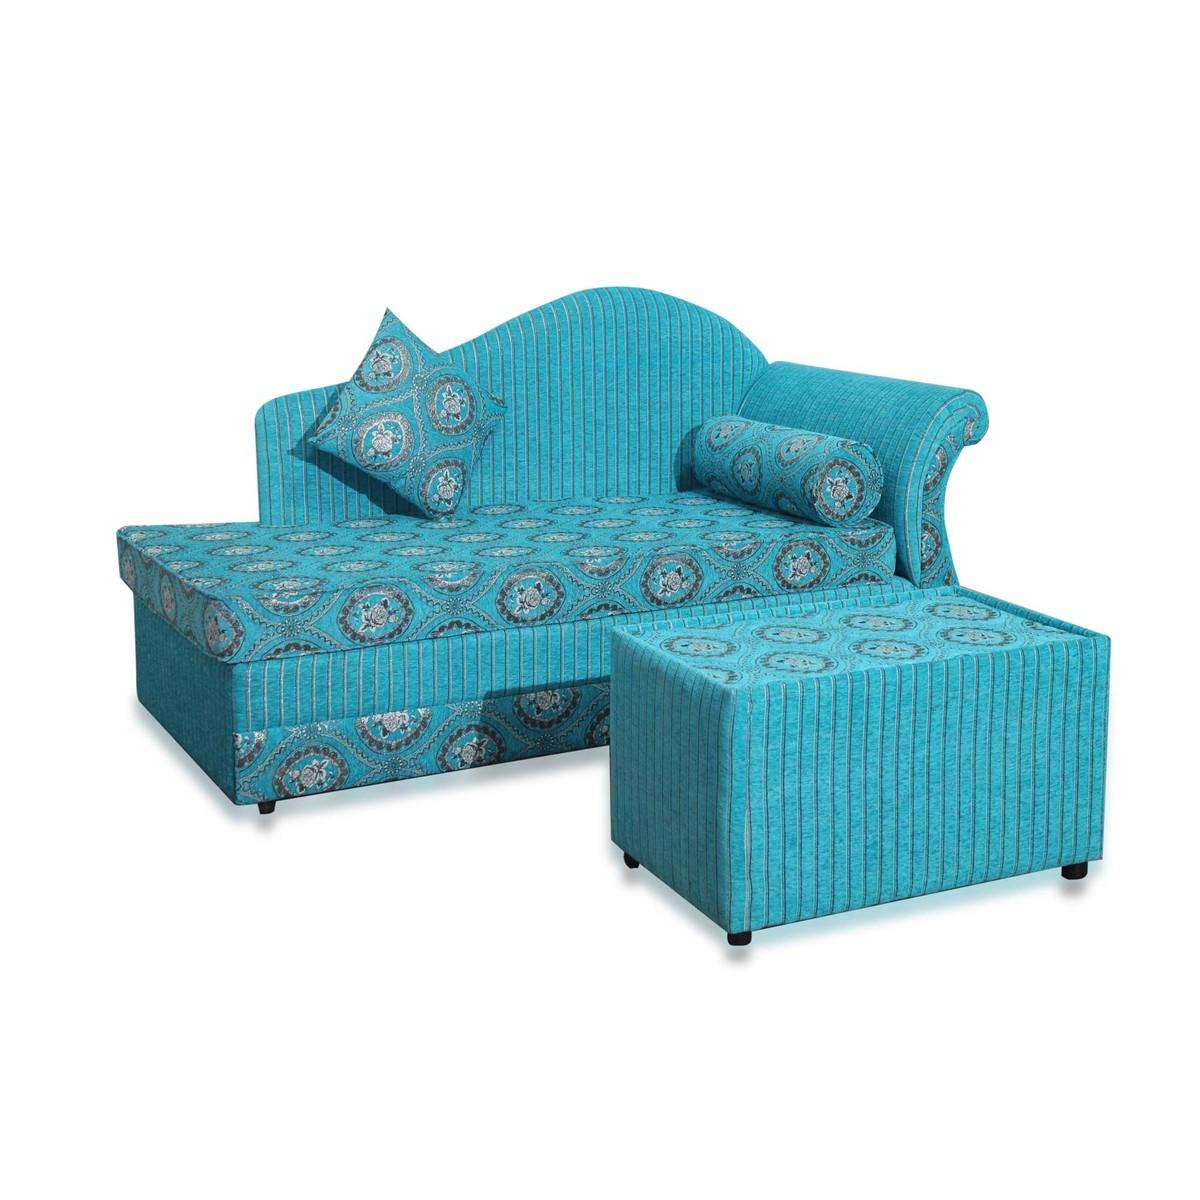 Design Plus Diwan Sofa Set Ml05 Online Lulu